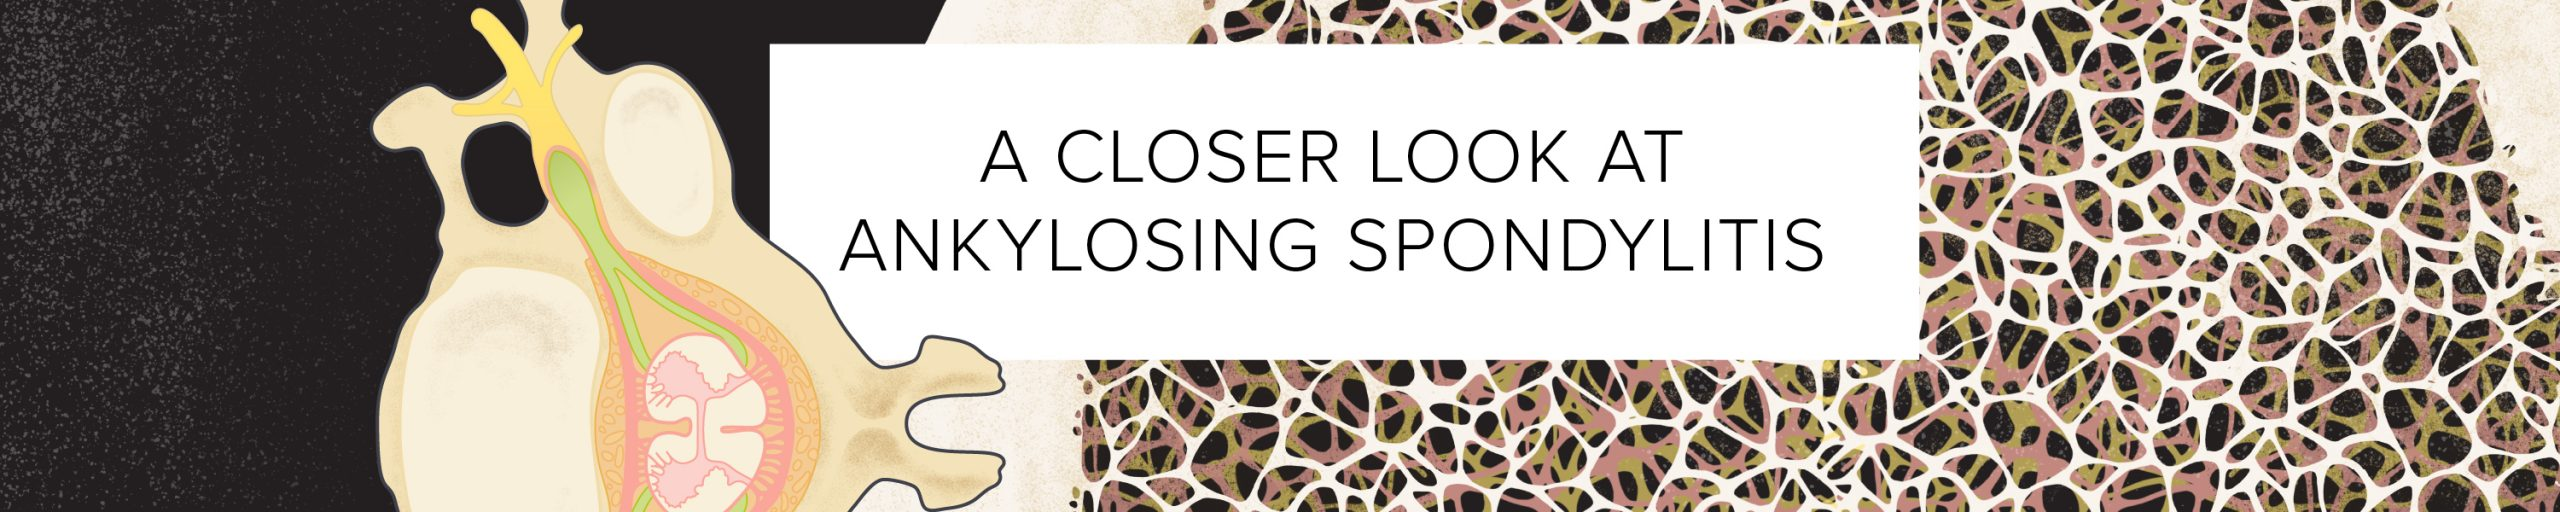 A Closer Look at Ankylosing Spondylitis